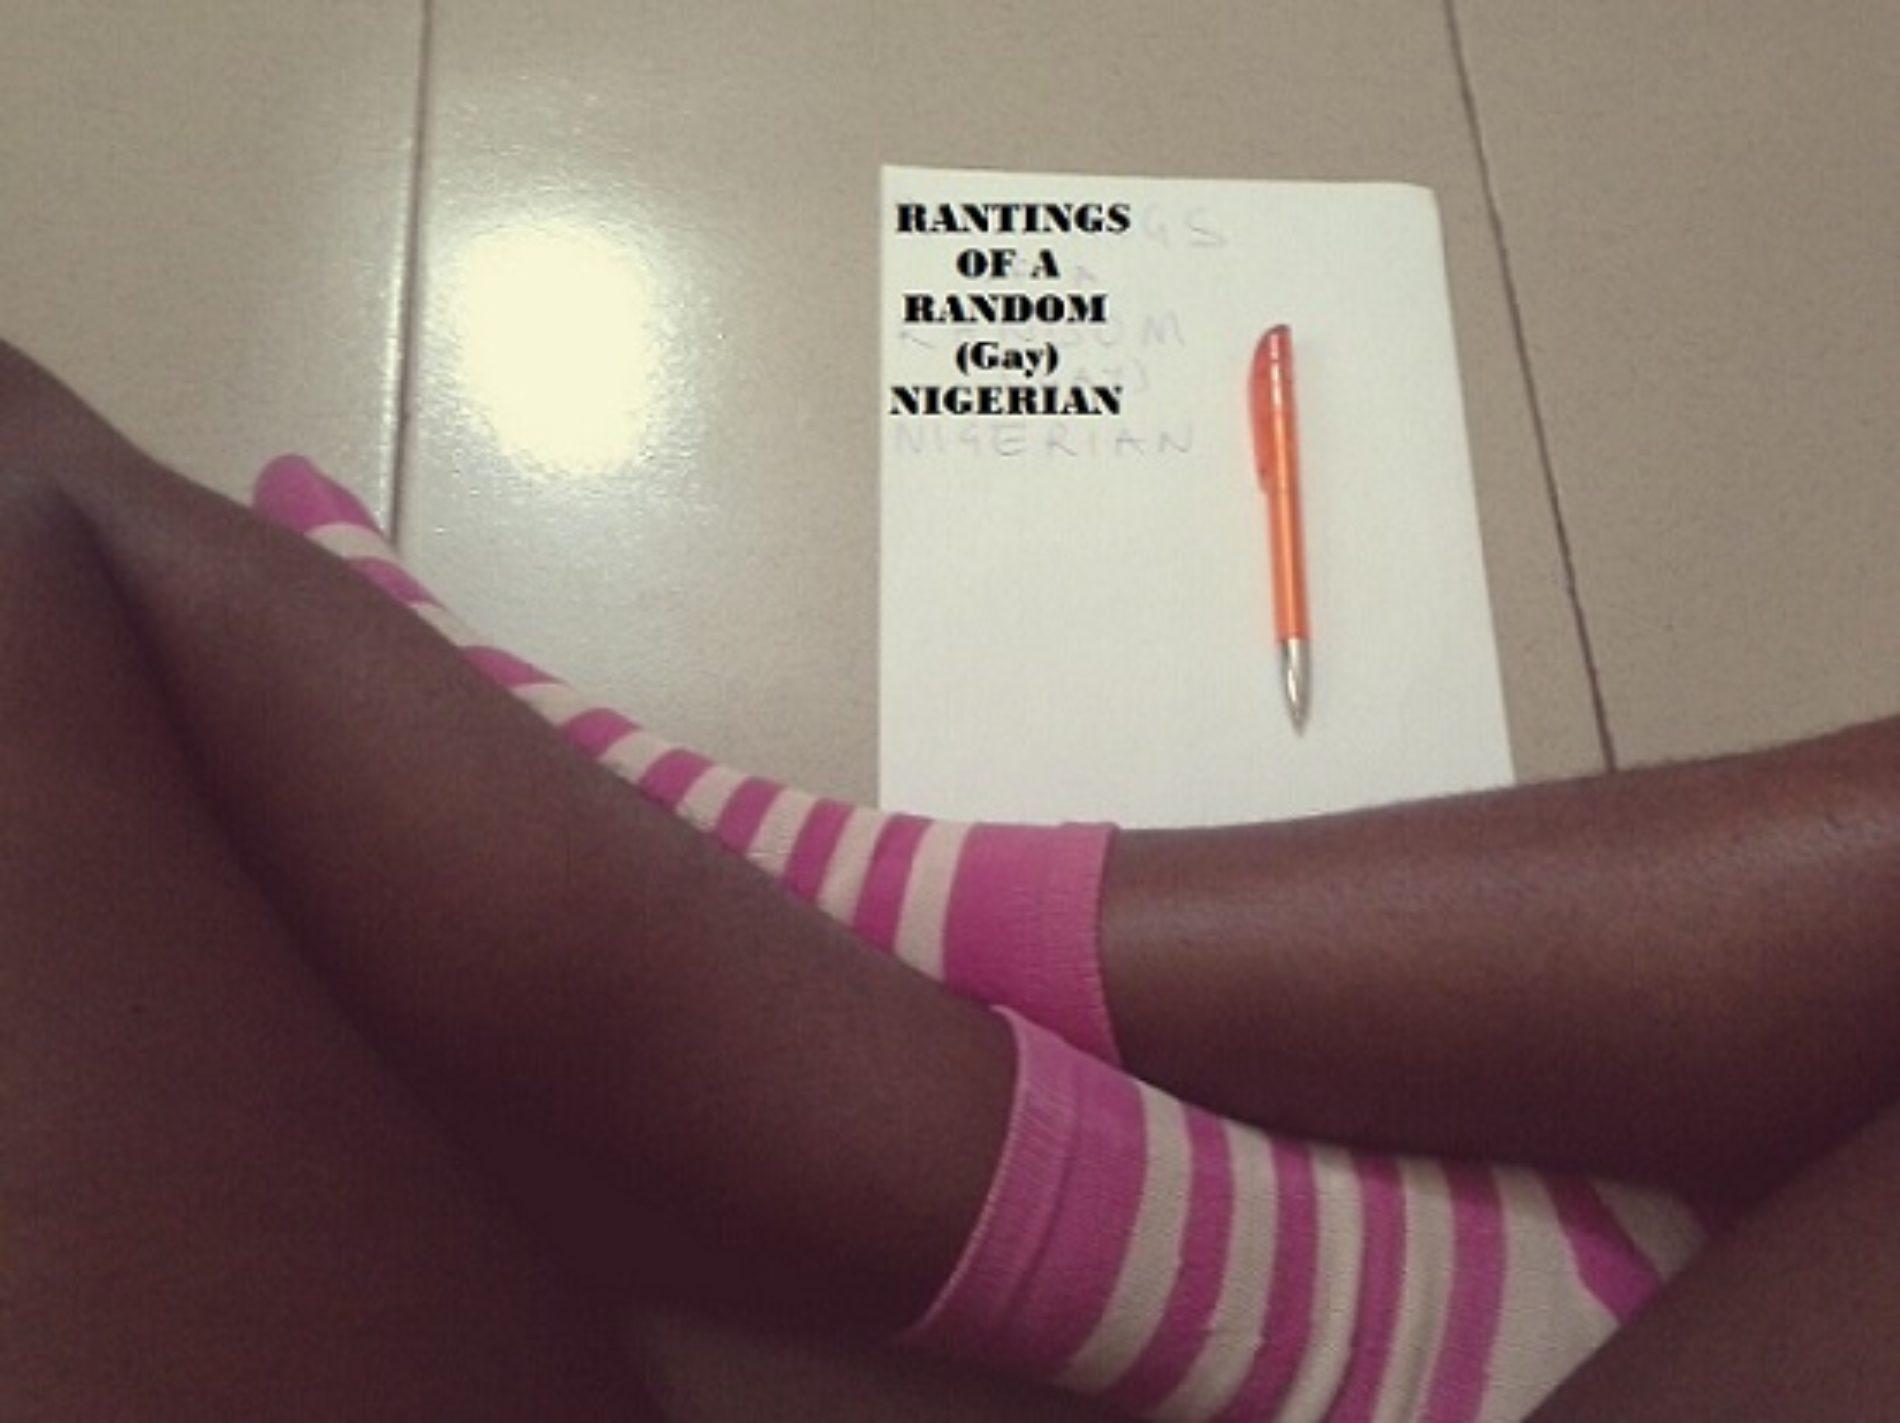 RANTINGS OF A RANDOM (Gay) NIGERIAN (Entry 30)